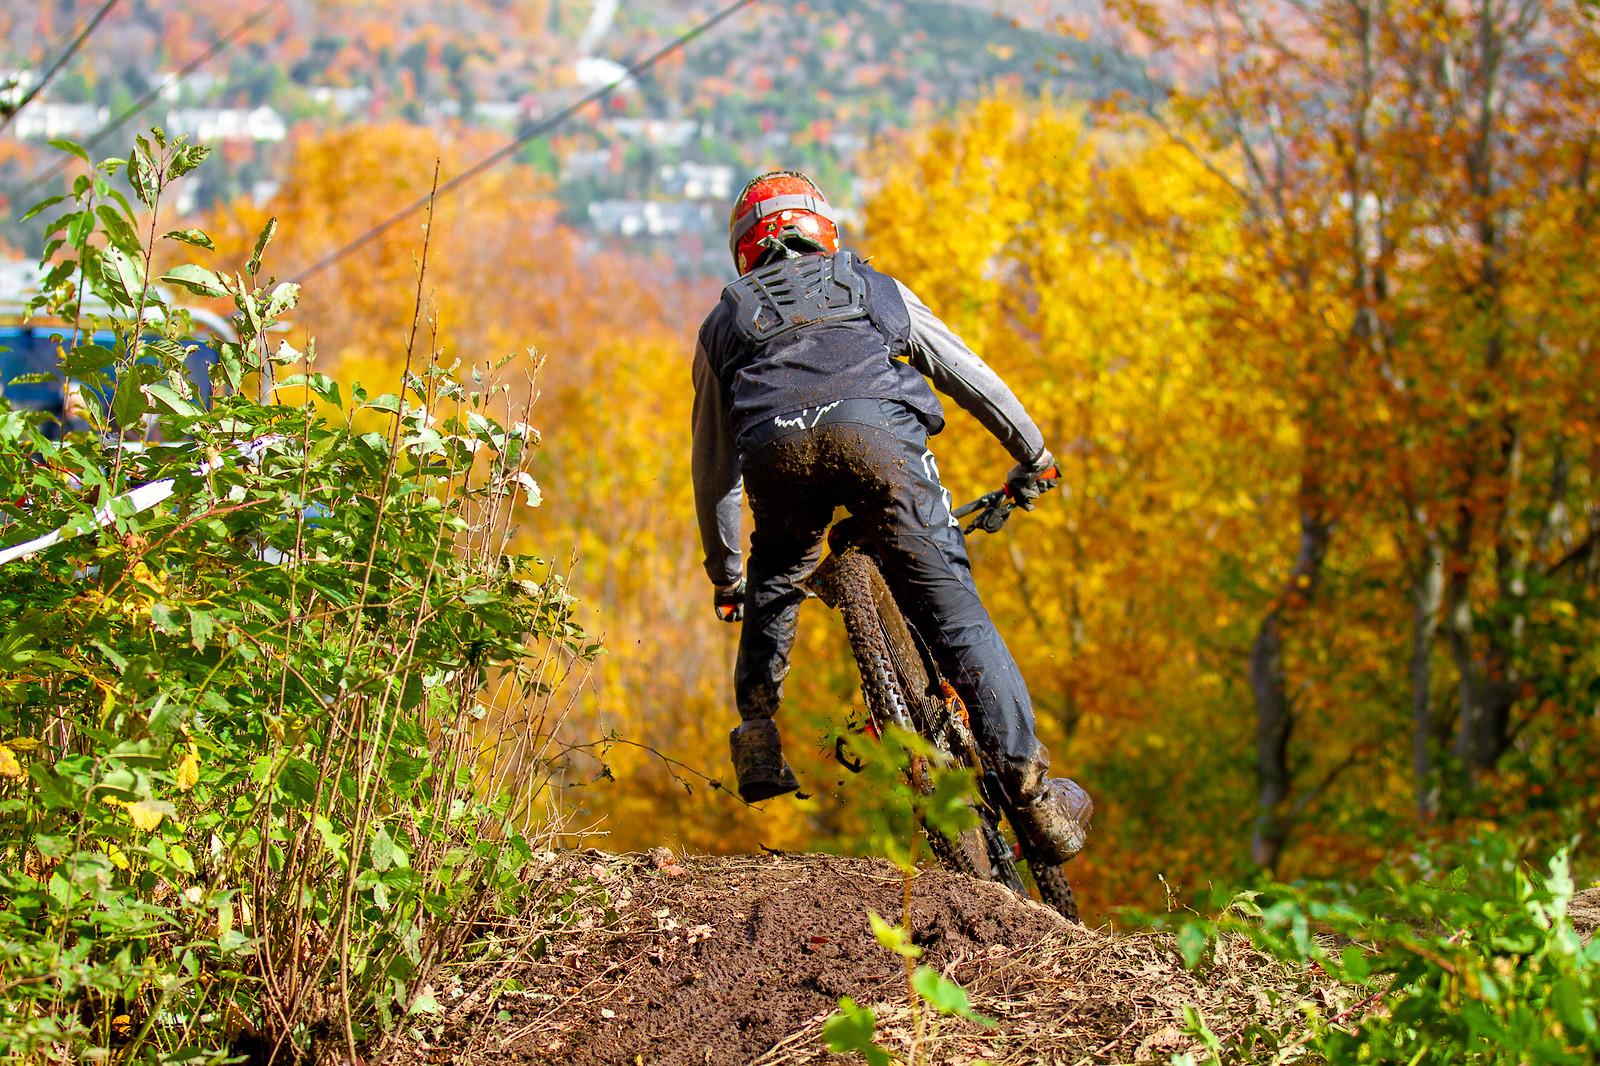 Joshua Miller - JackRice - Mountain Biking Pictures - Vital MTB